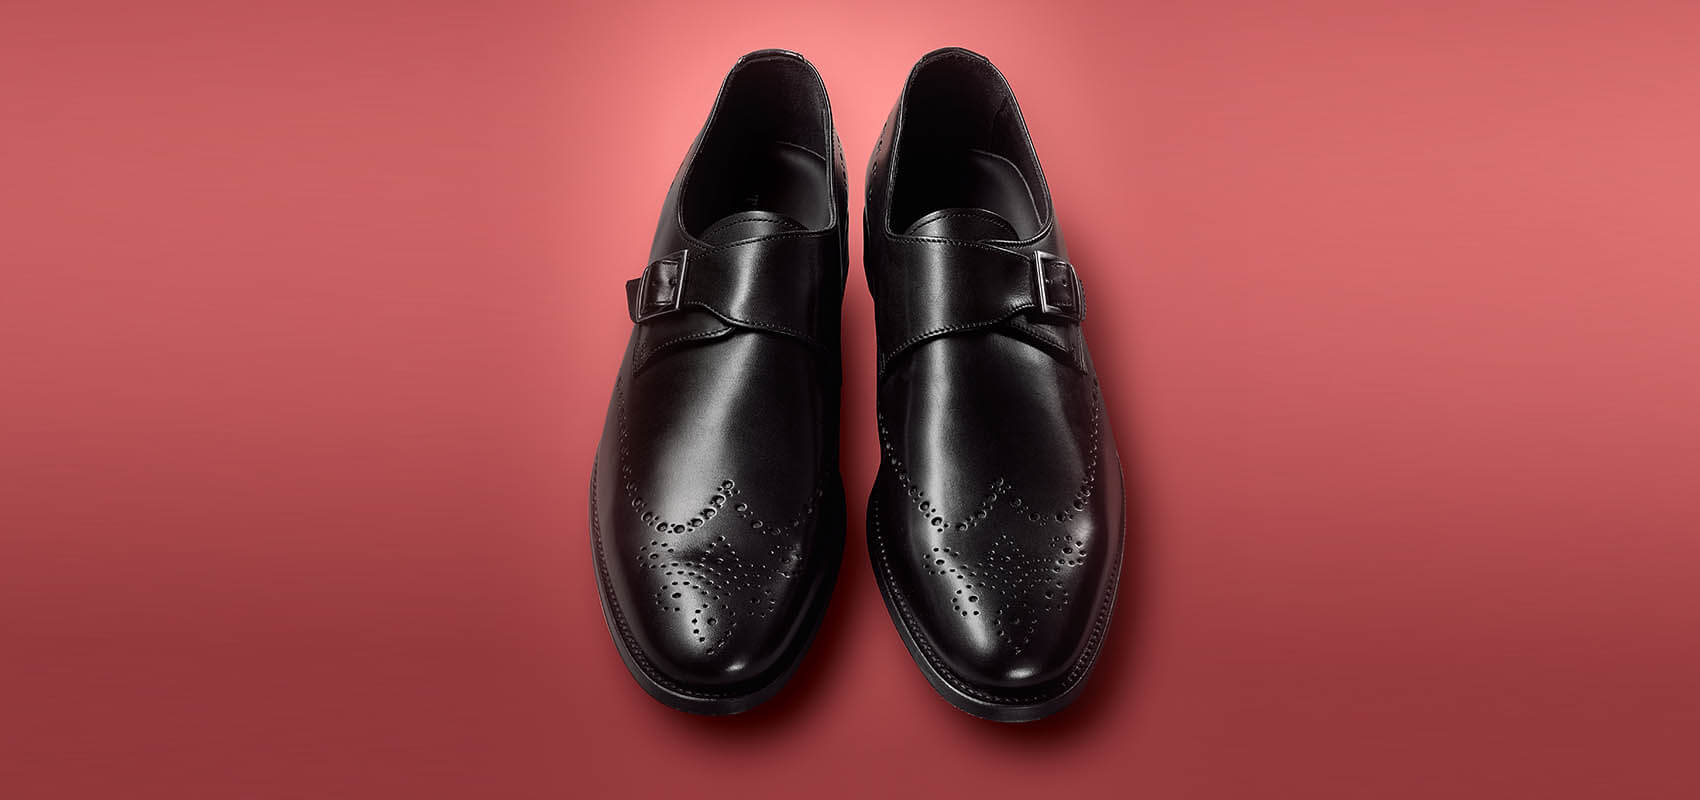 Charles Tyrwhitt Shoes